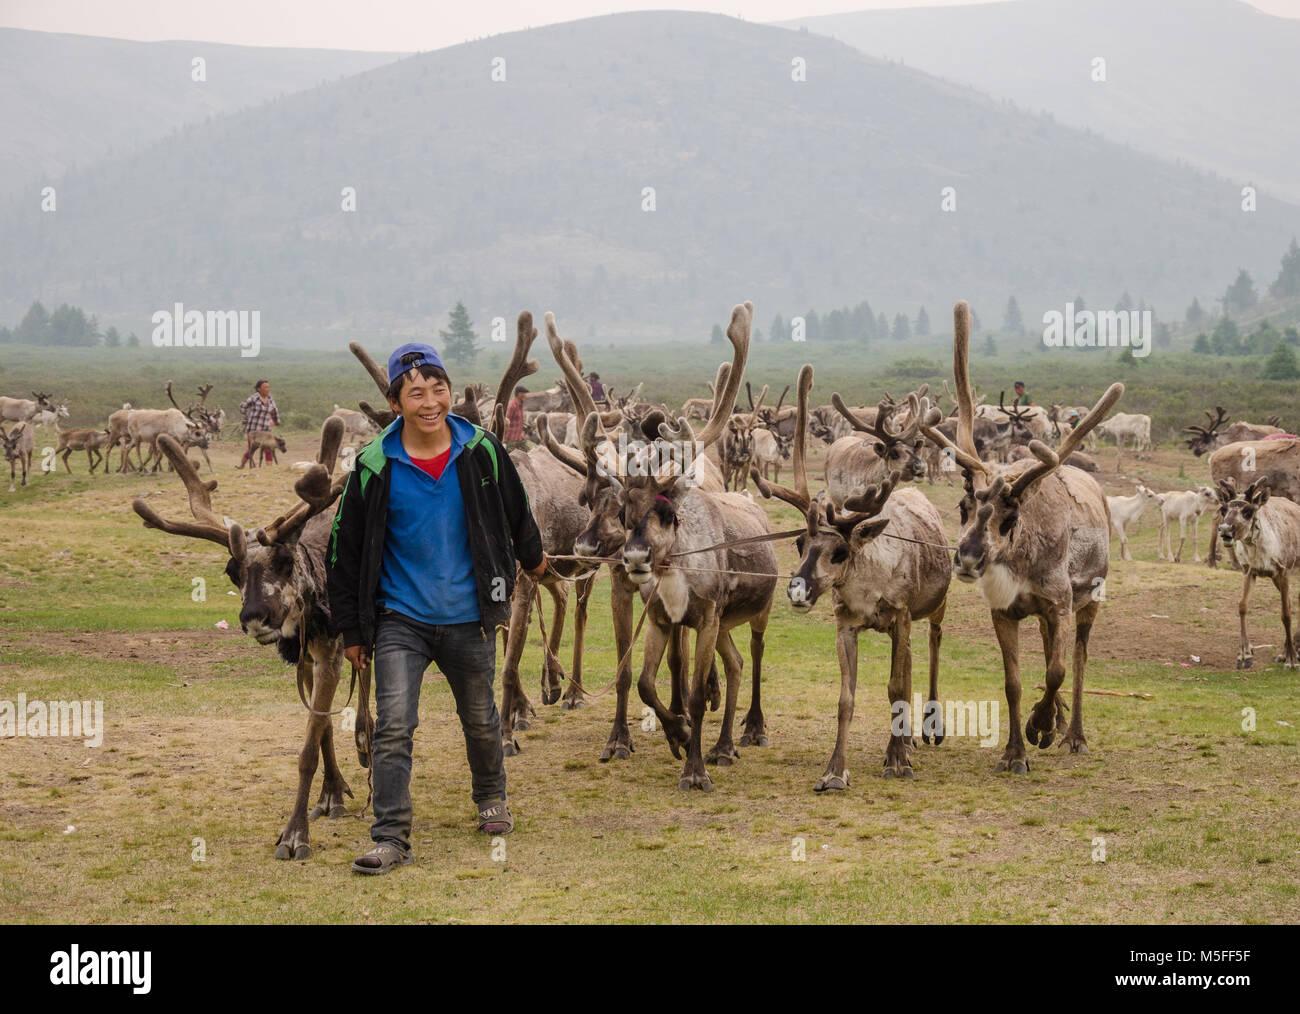 Tsaatan Life, Reindeer Herder, Tsaaganuur, Mongolia - Stock Image